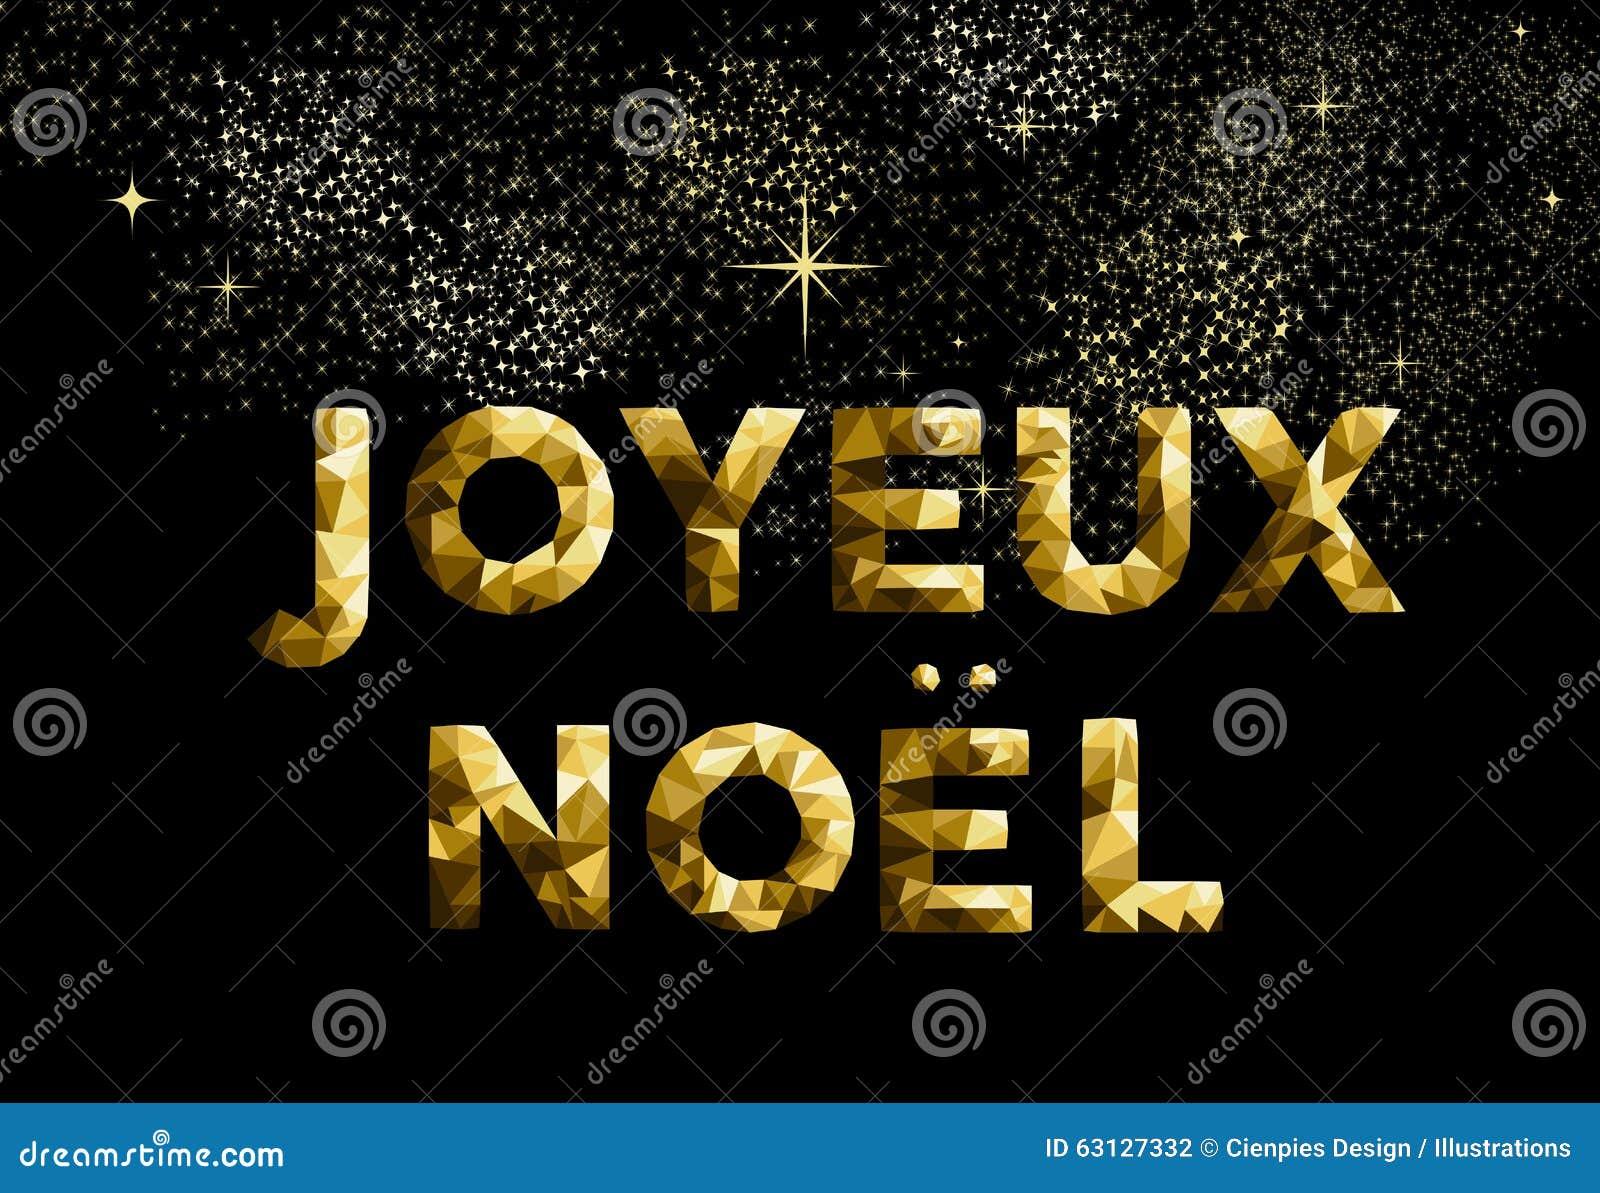 Merry Christmas French Joyeux Noel France Country Stock Vector ...